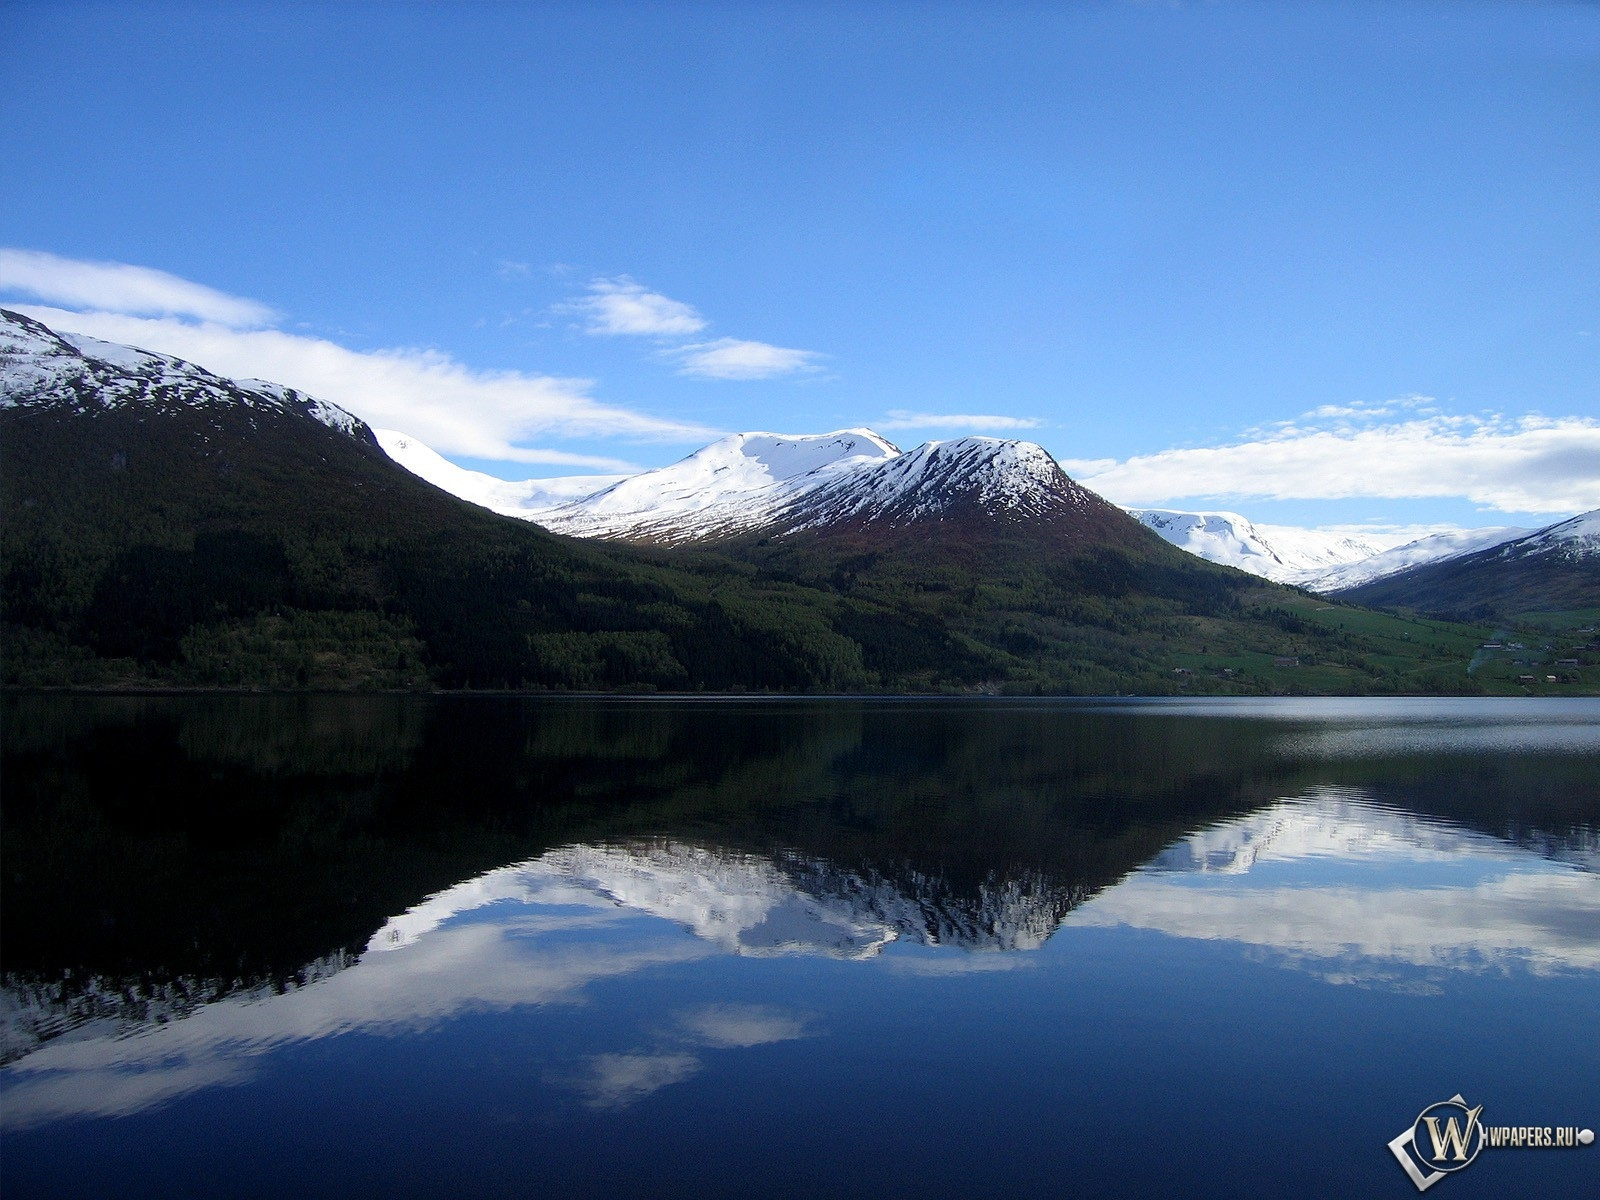 Горное озеро 1600x1200